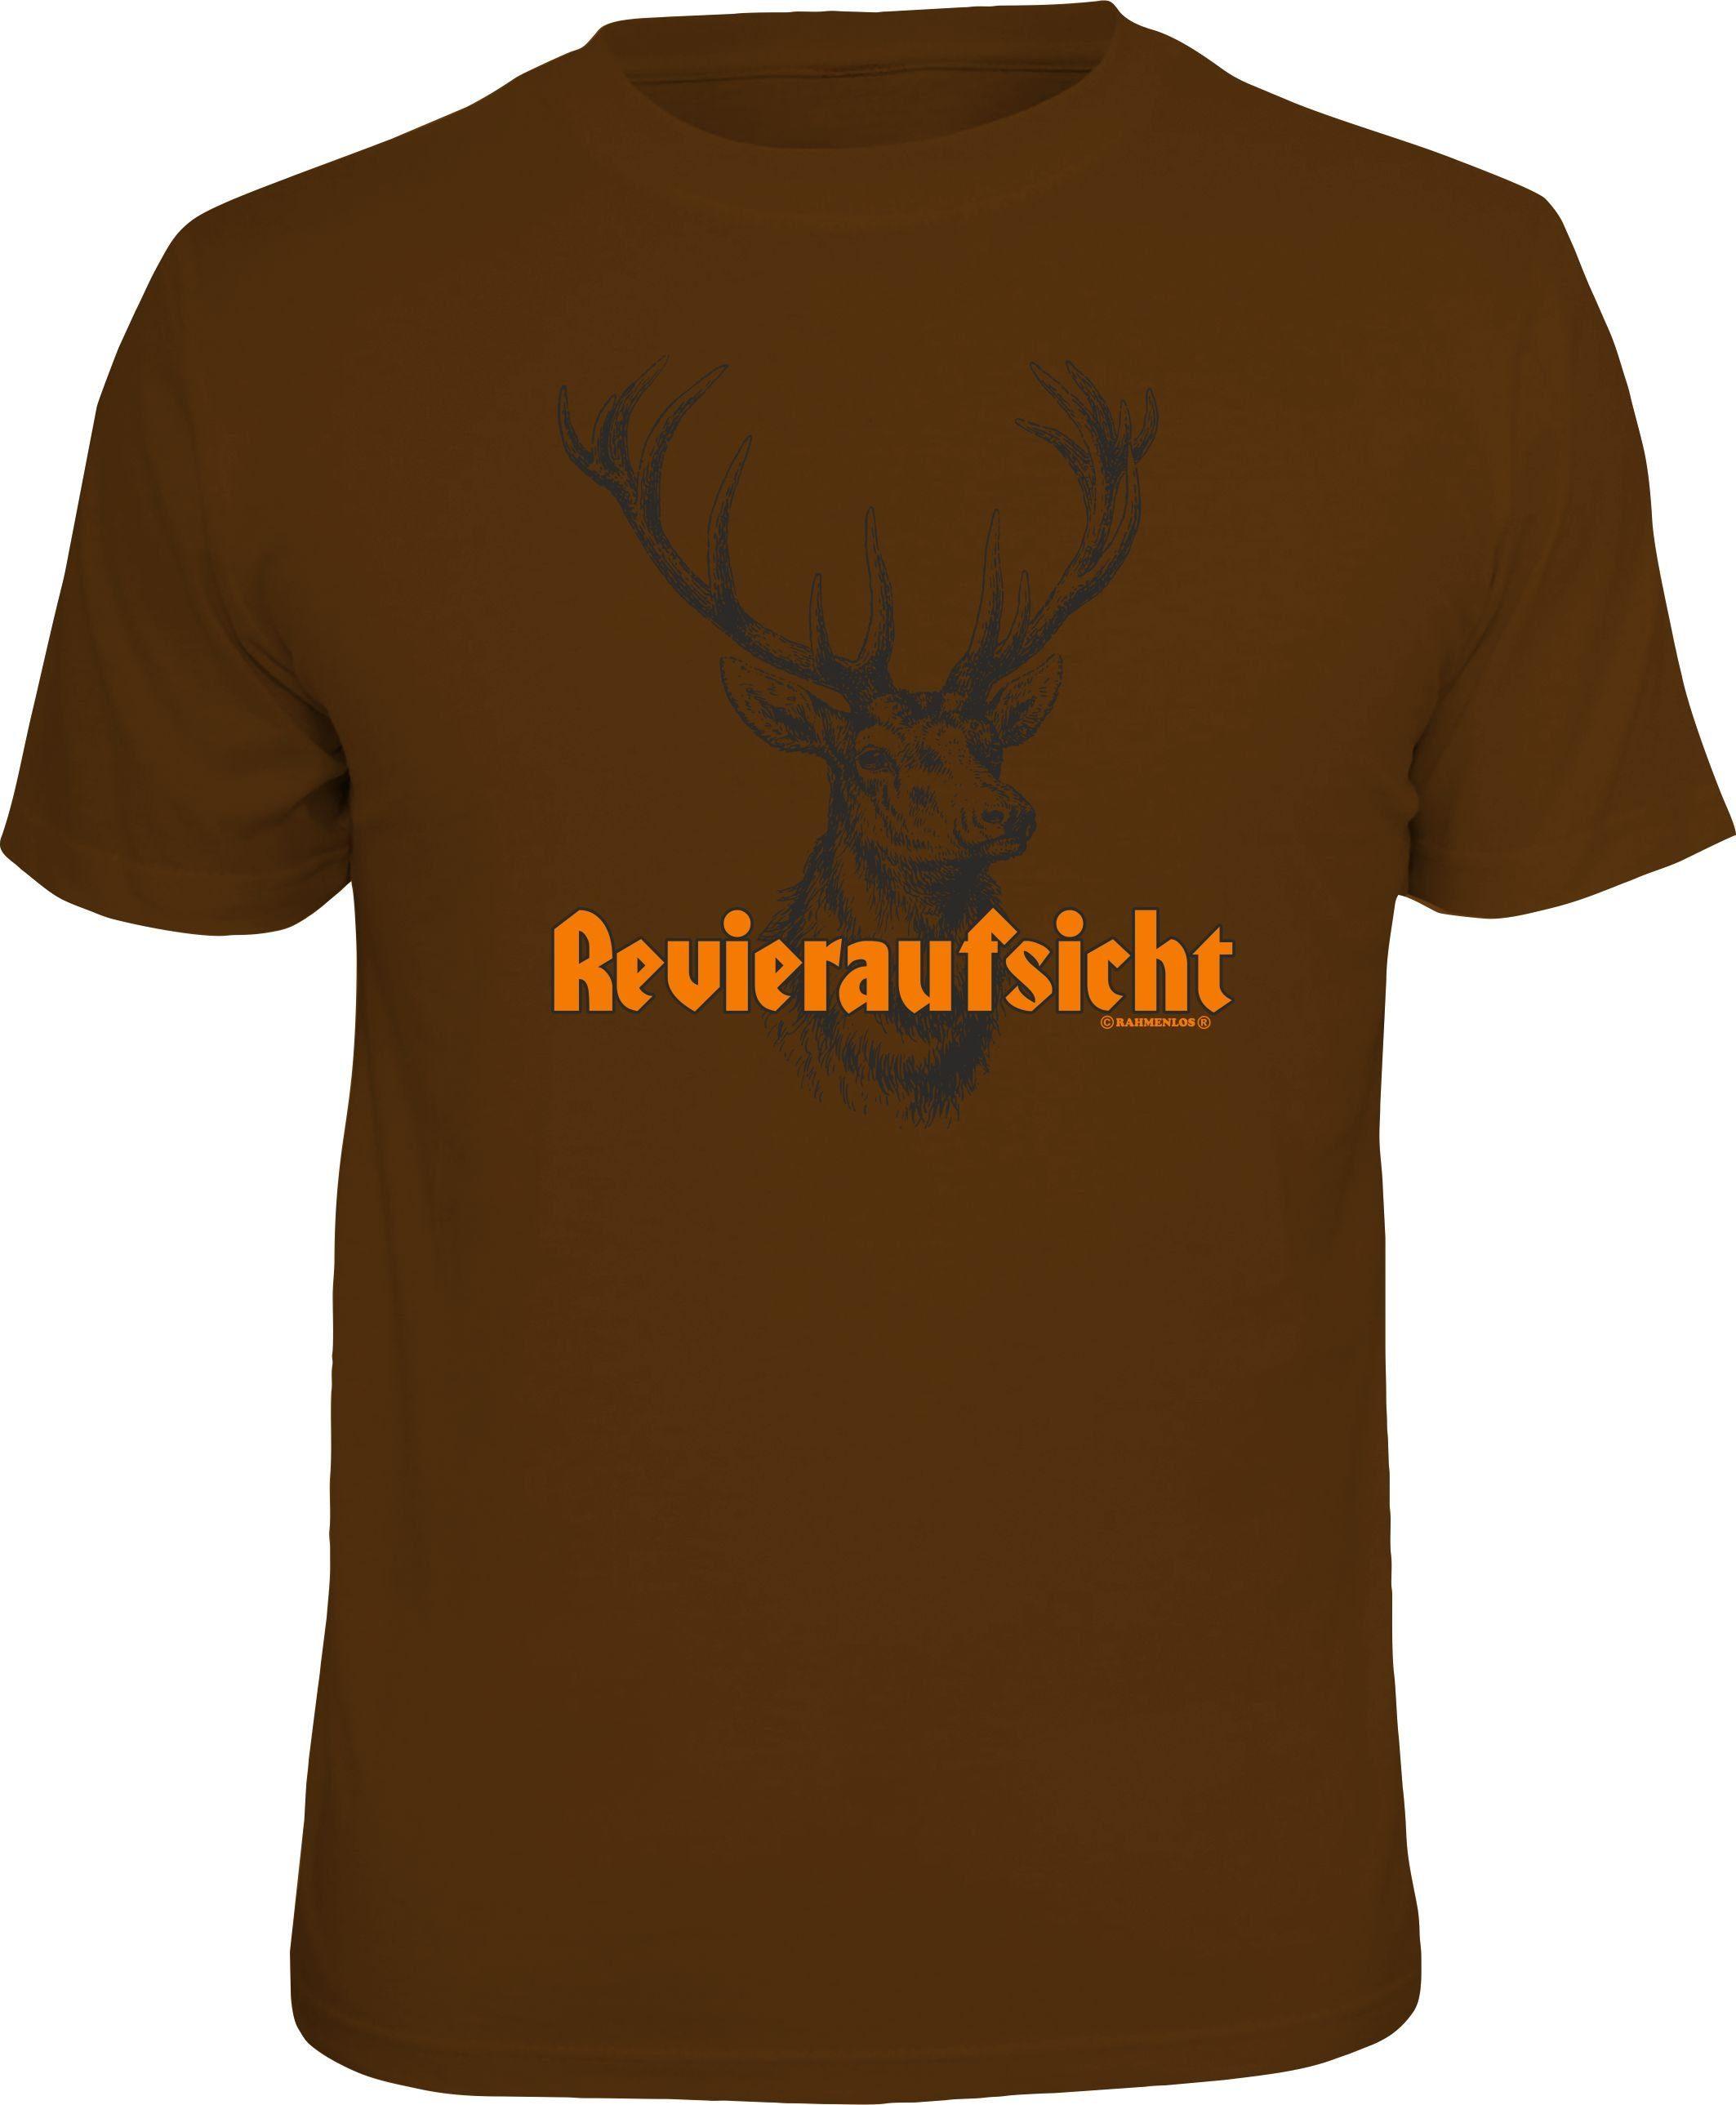 Rahmenlos T-Shirt »Revieraufsicht«